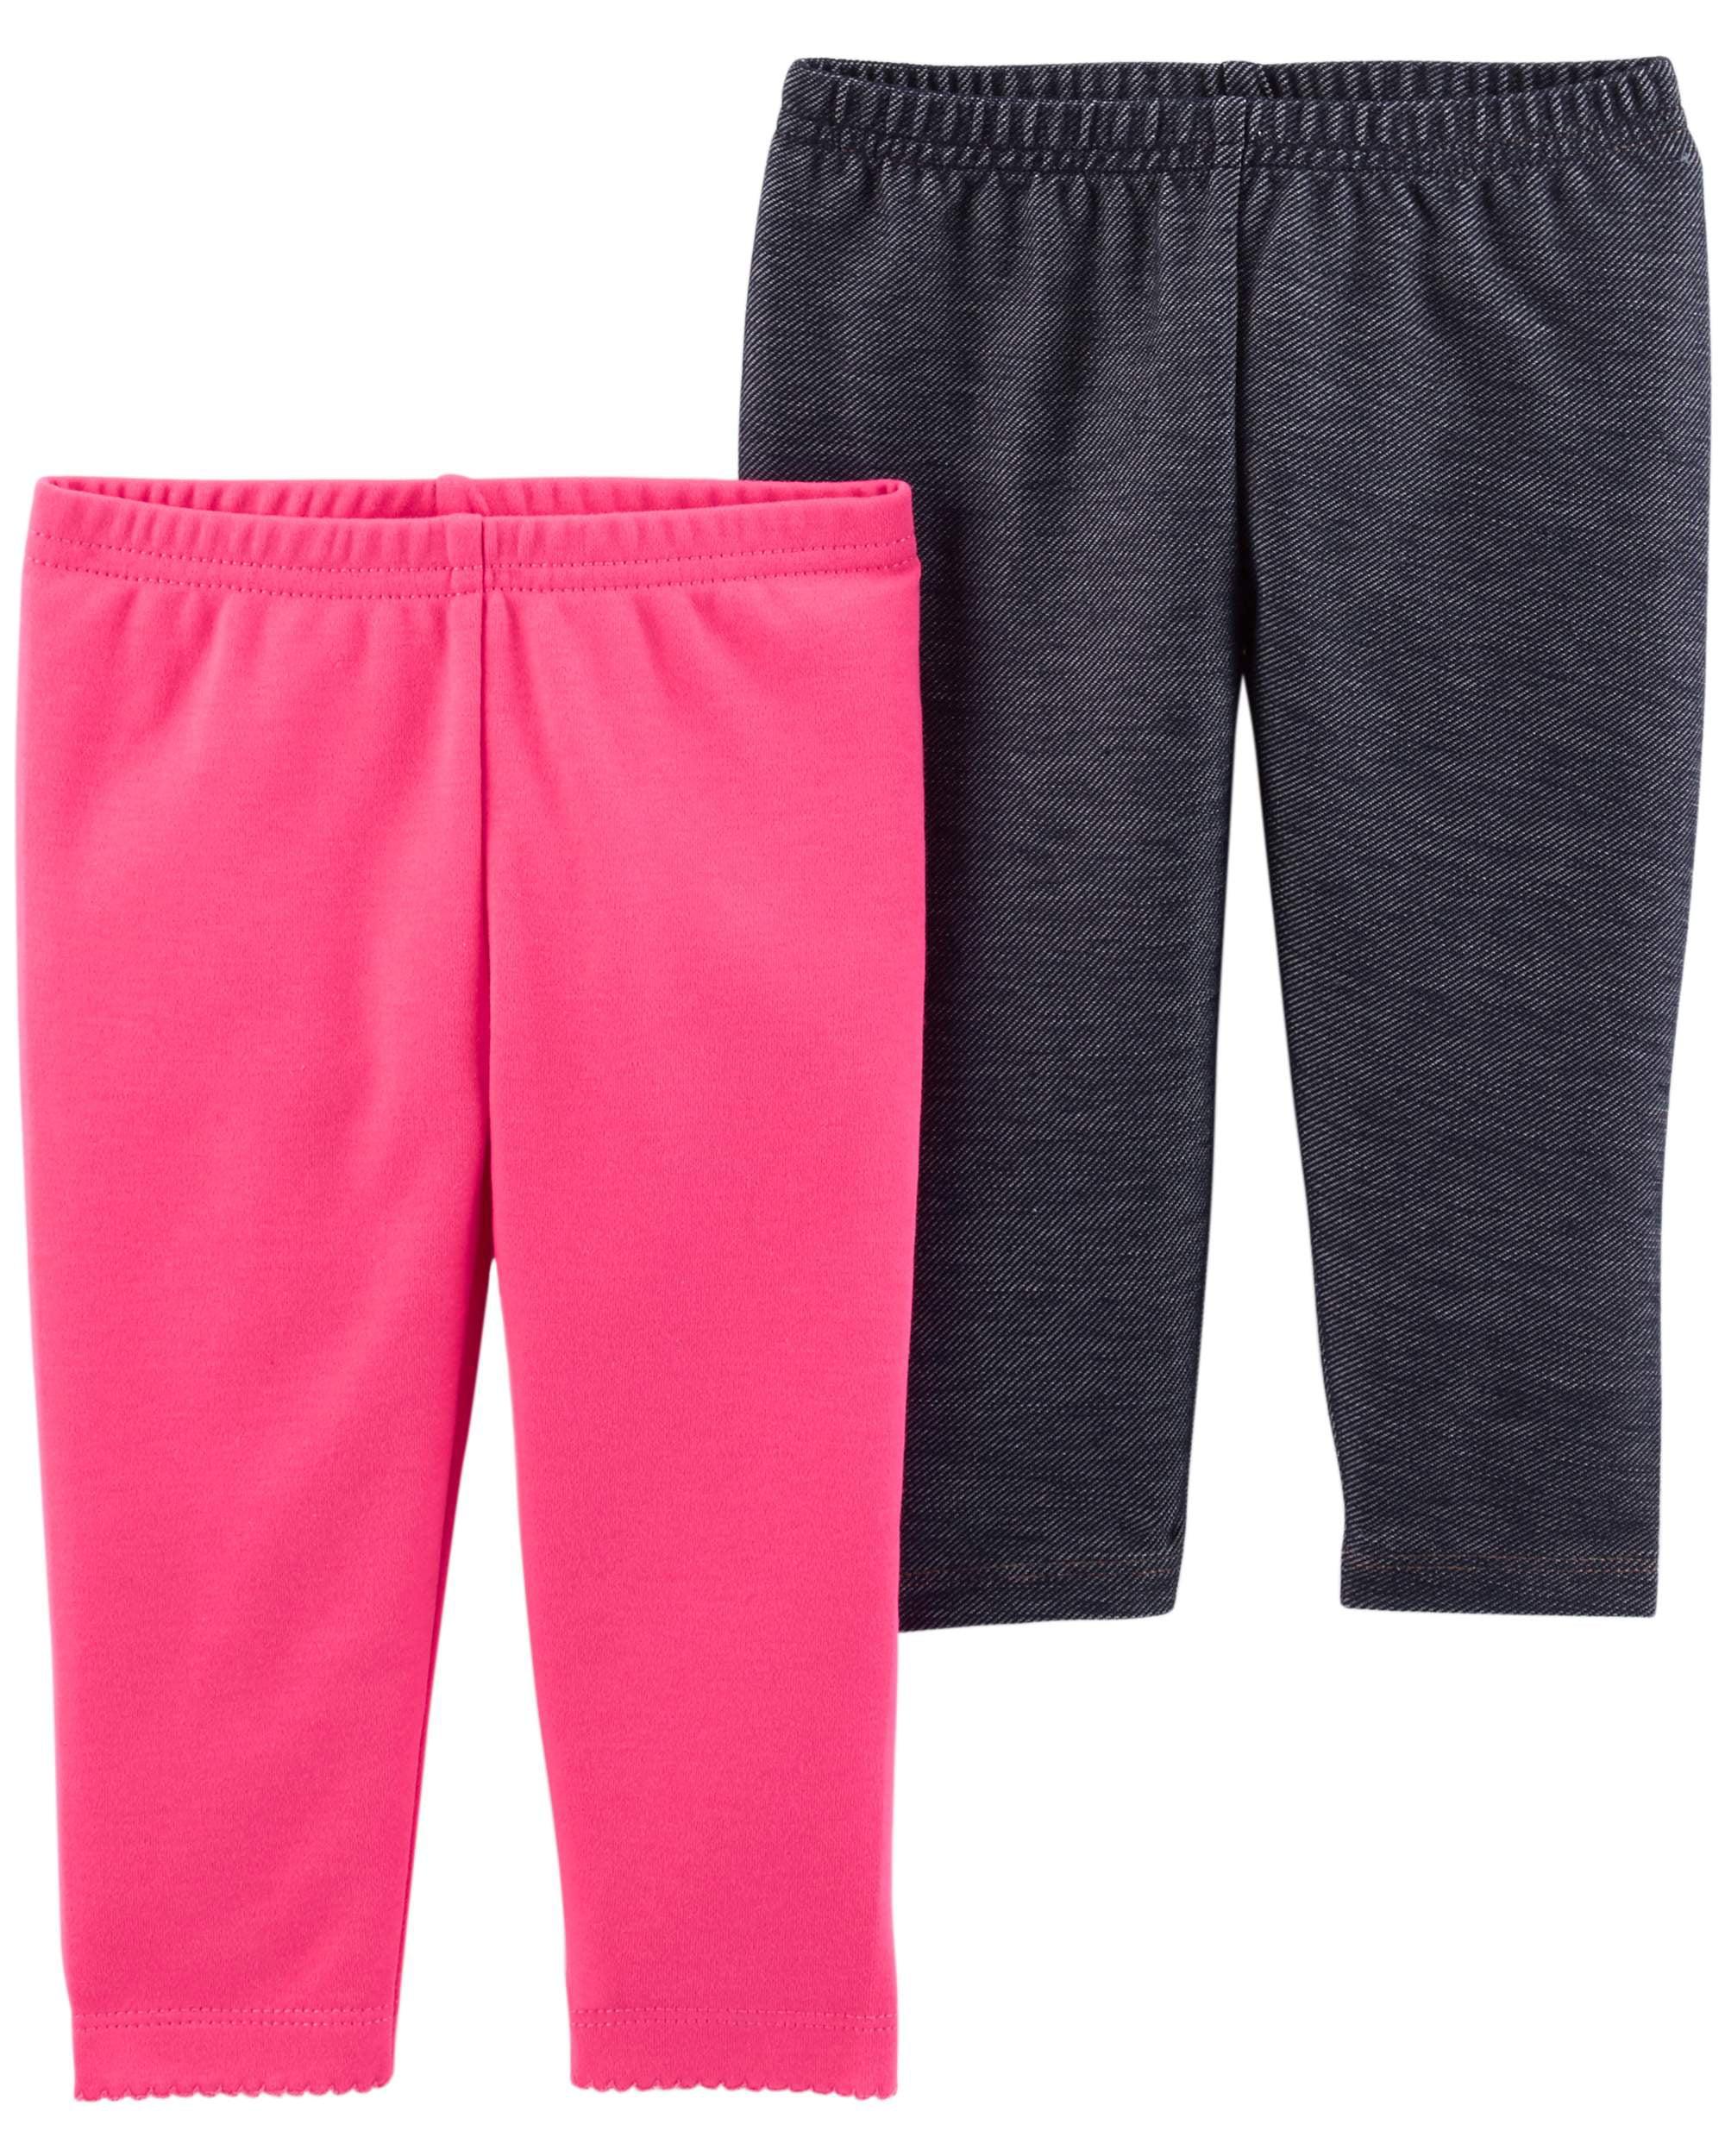 Pants, 2-pack (Baby Girls)